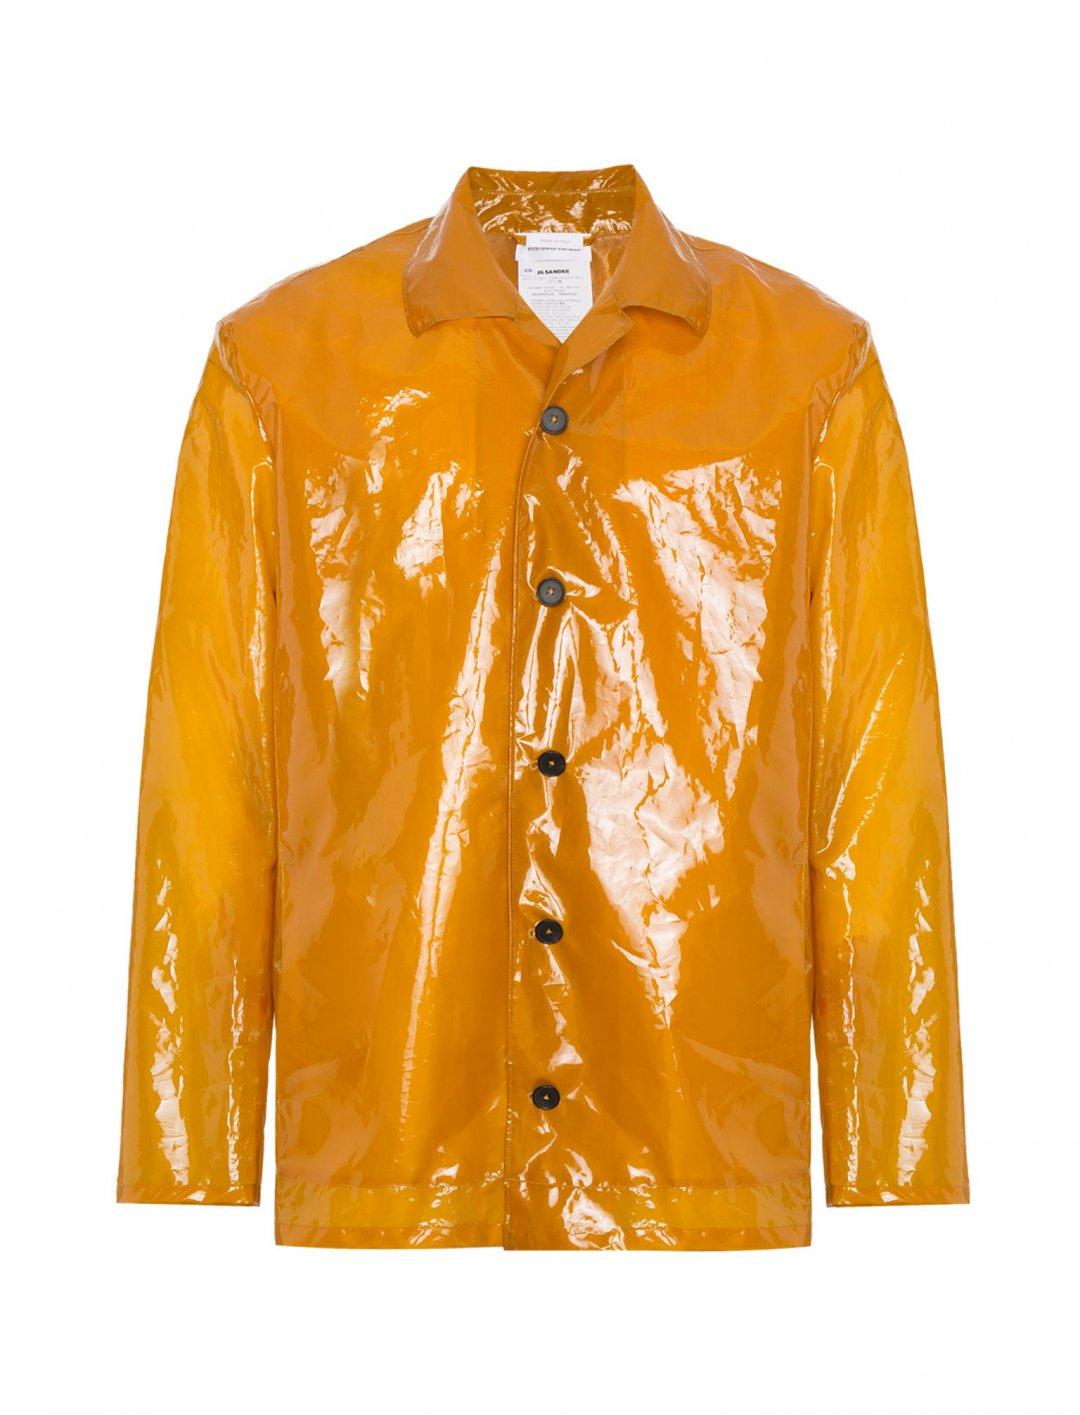 "Tom Grennan's Plastic Raincoat {""id"":5,""product_section_id"":1,""name"":""Clothing"",""order"":5} Jil Sander"